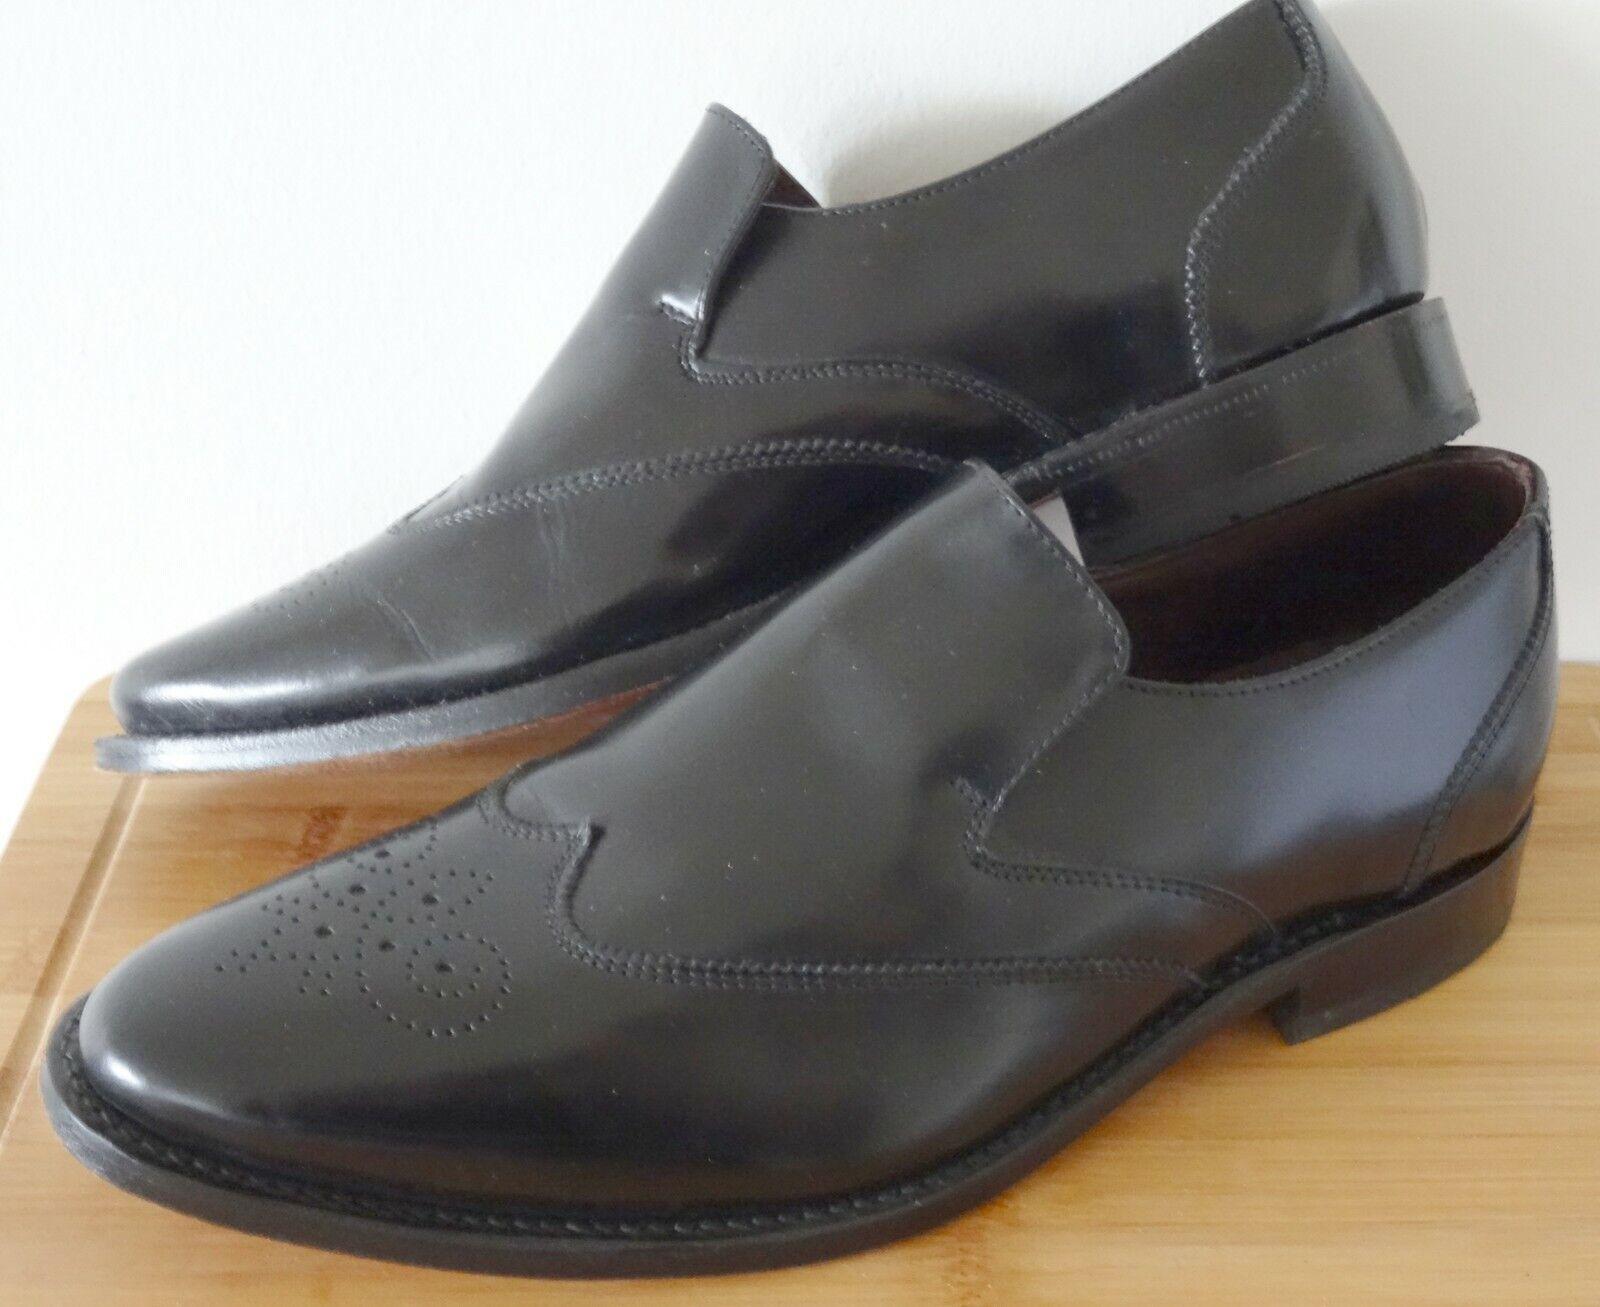 Samuel Windsor Hand-Made Black All Leather Slip-On Shoes UK Size 8.5